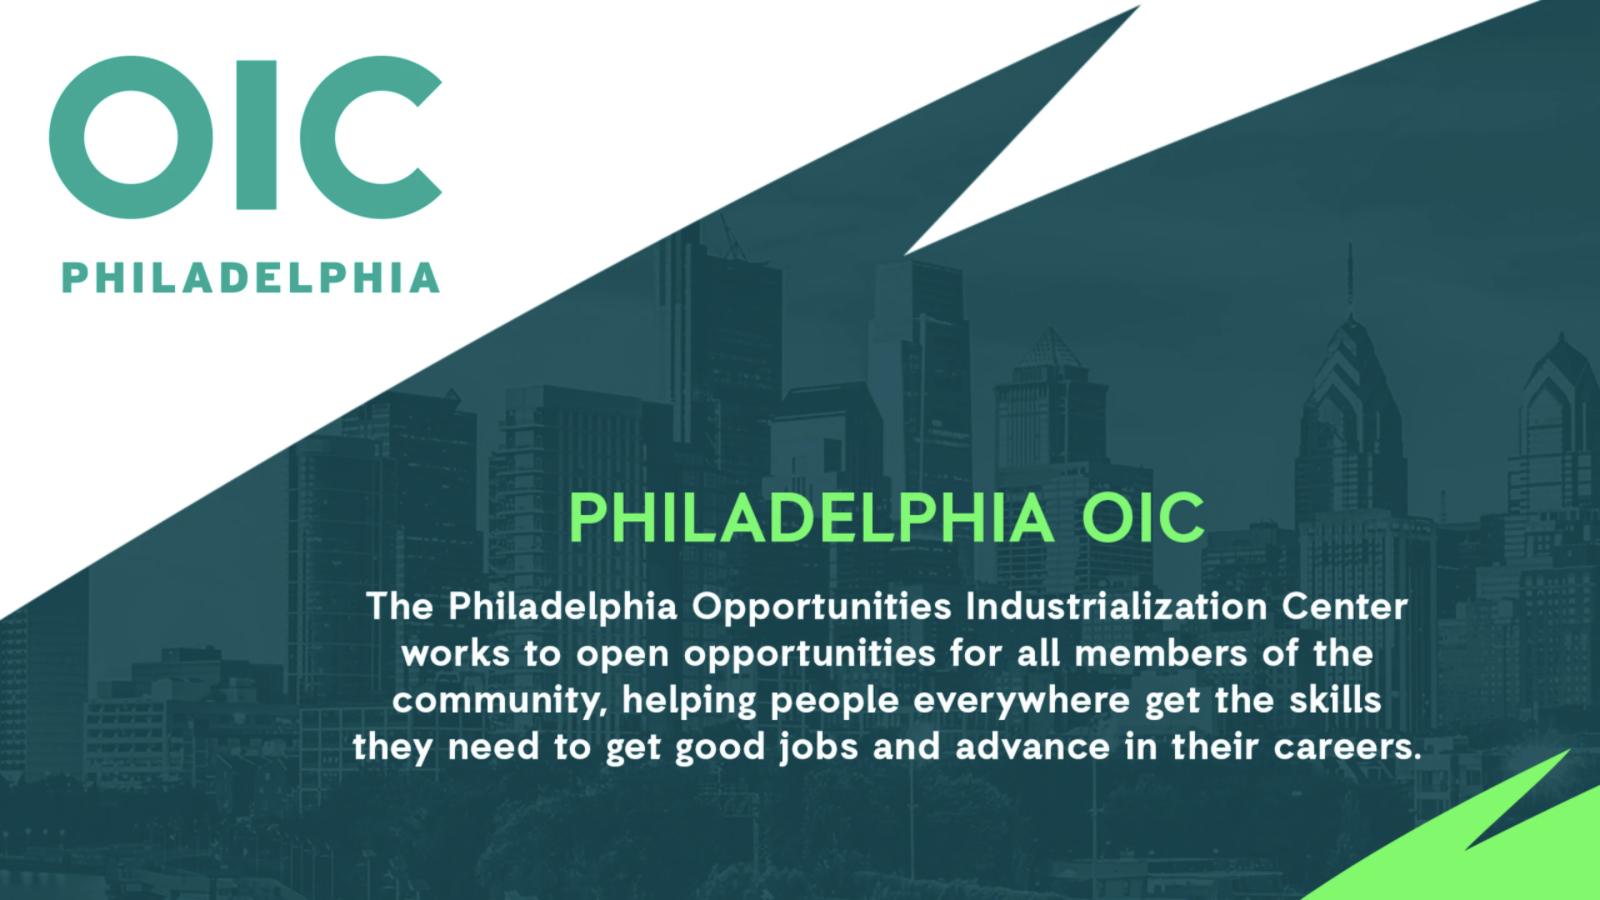 Philadelphia Eagles Support Philadelphia OIC